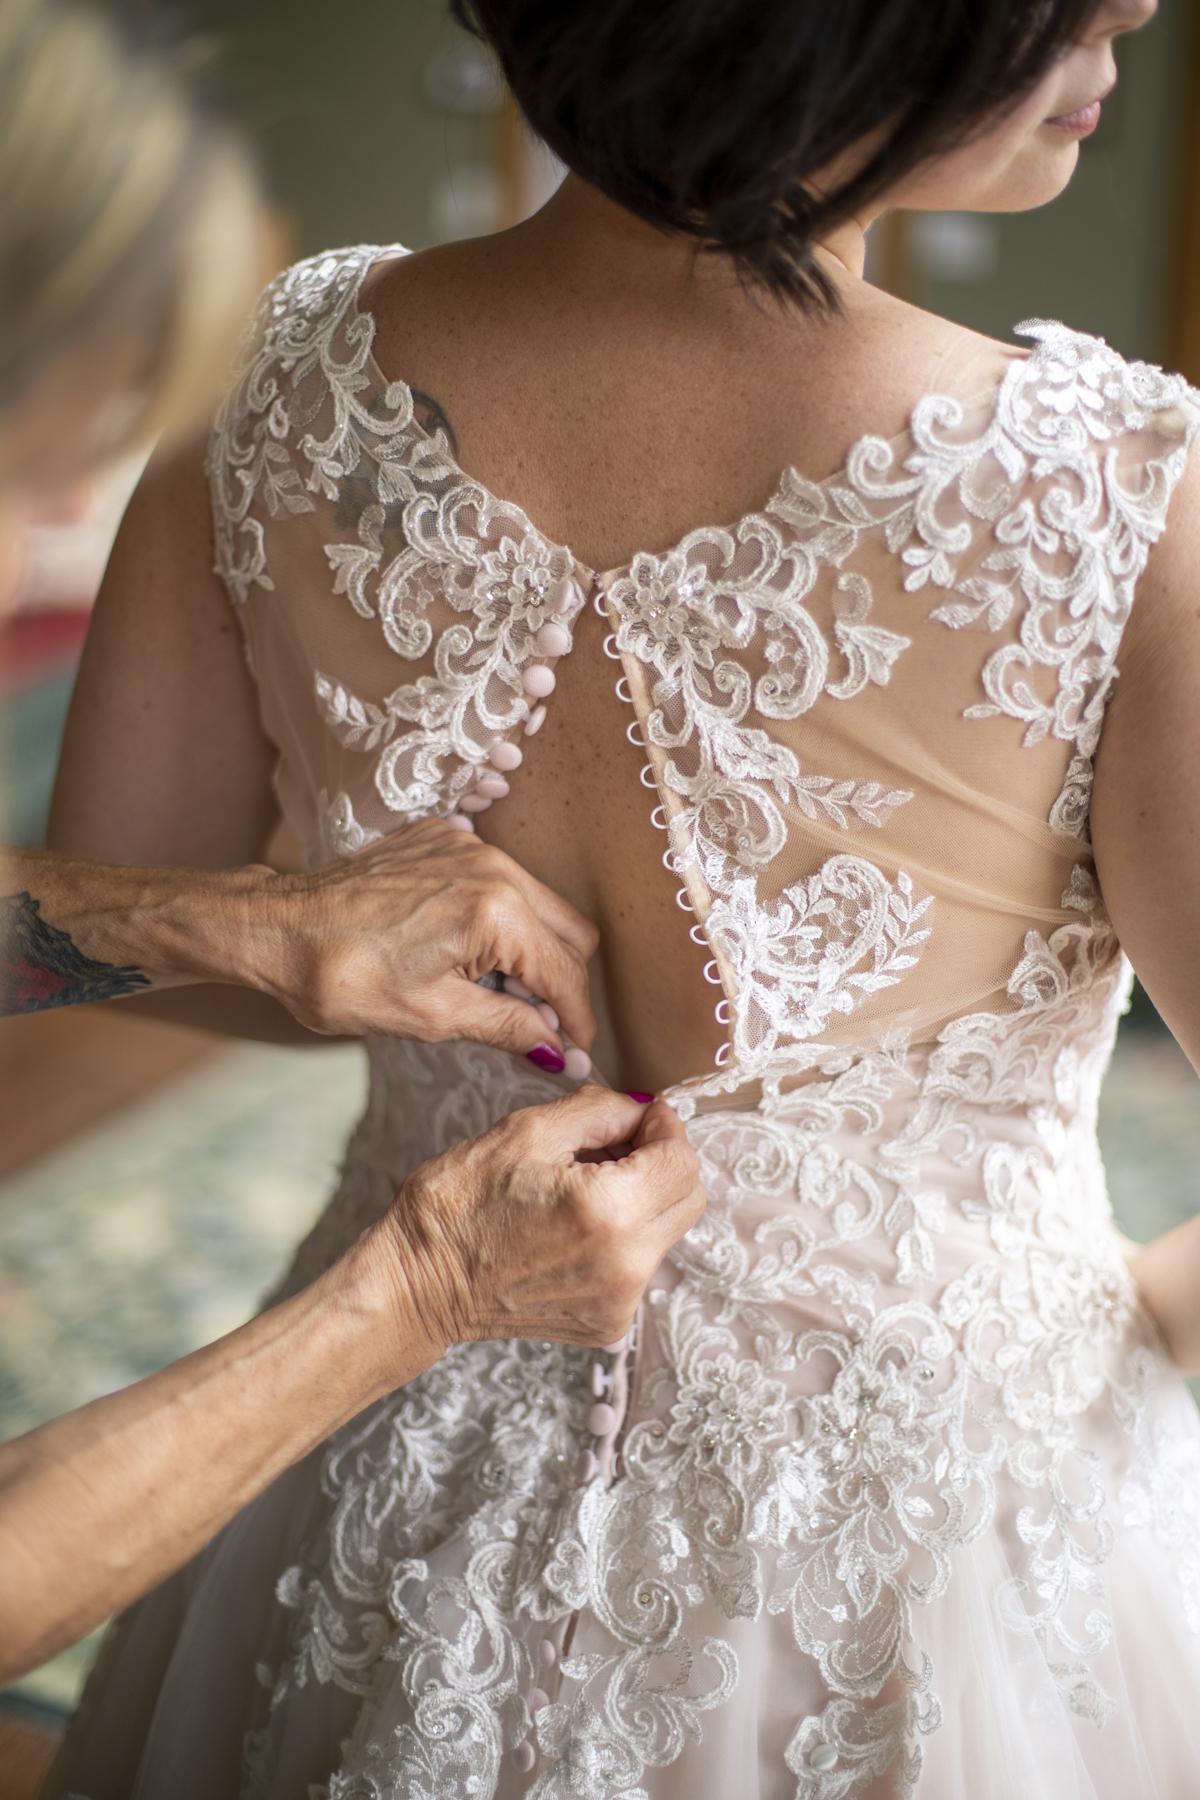 Avyanna and Phoenix Wedding 2019_photos by Studio Misha_BLOG-41.jpg